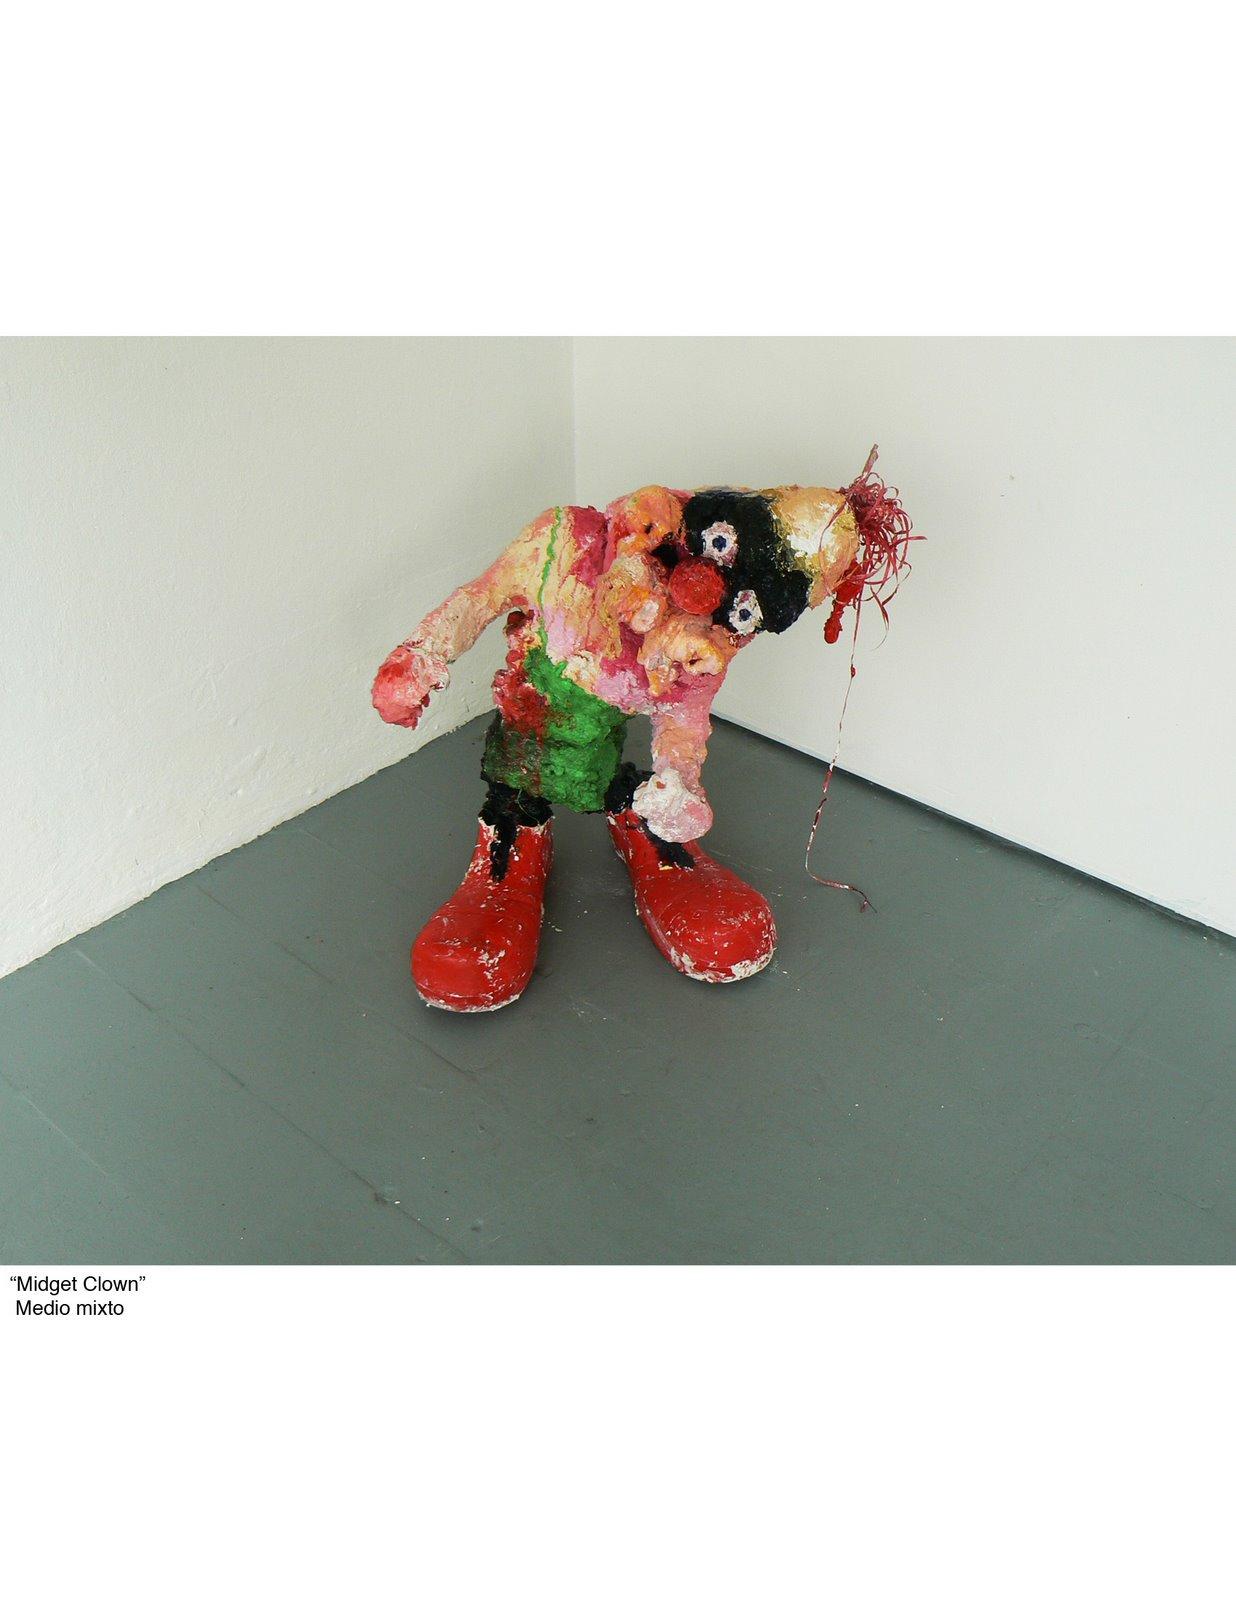 [7+midget+clown++]